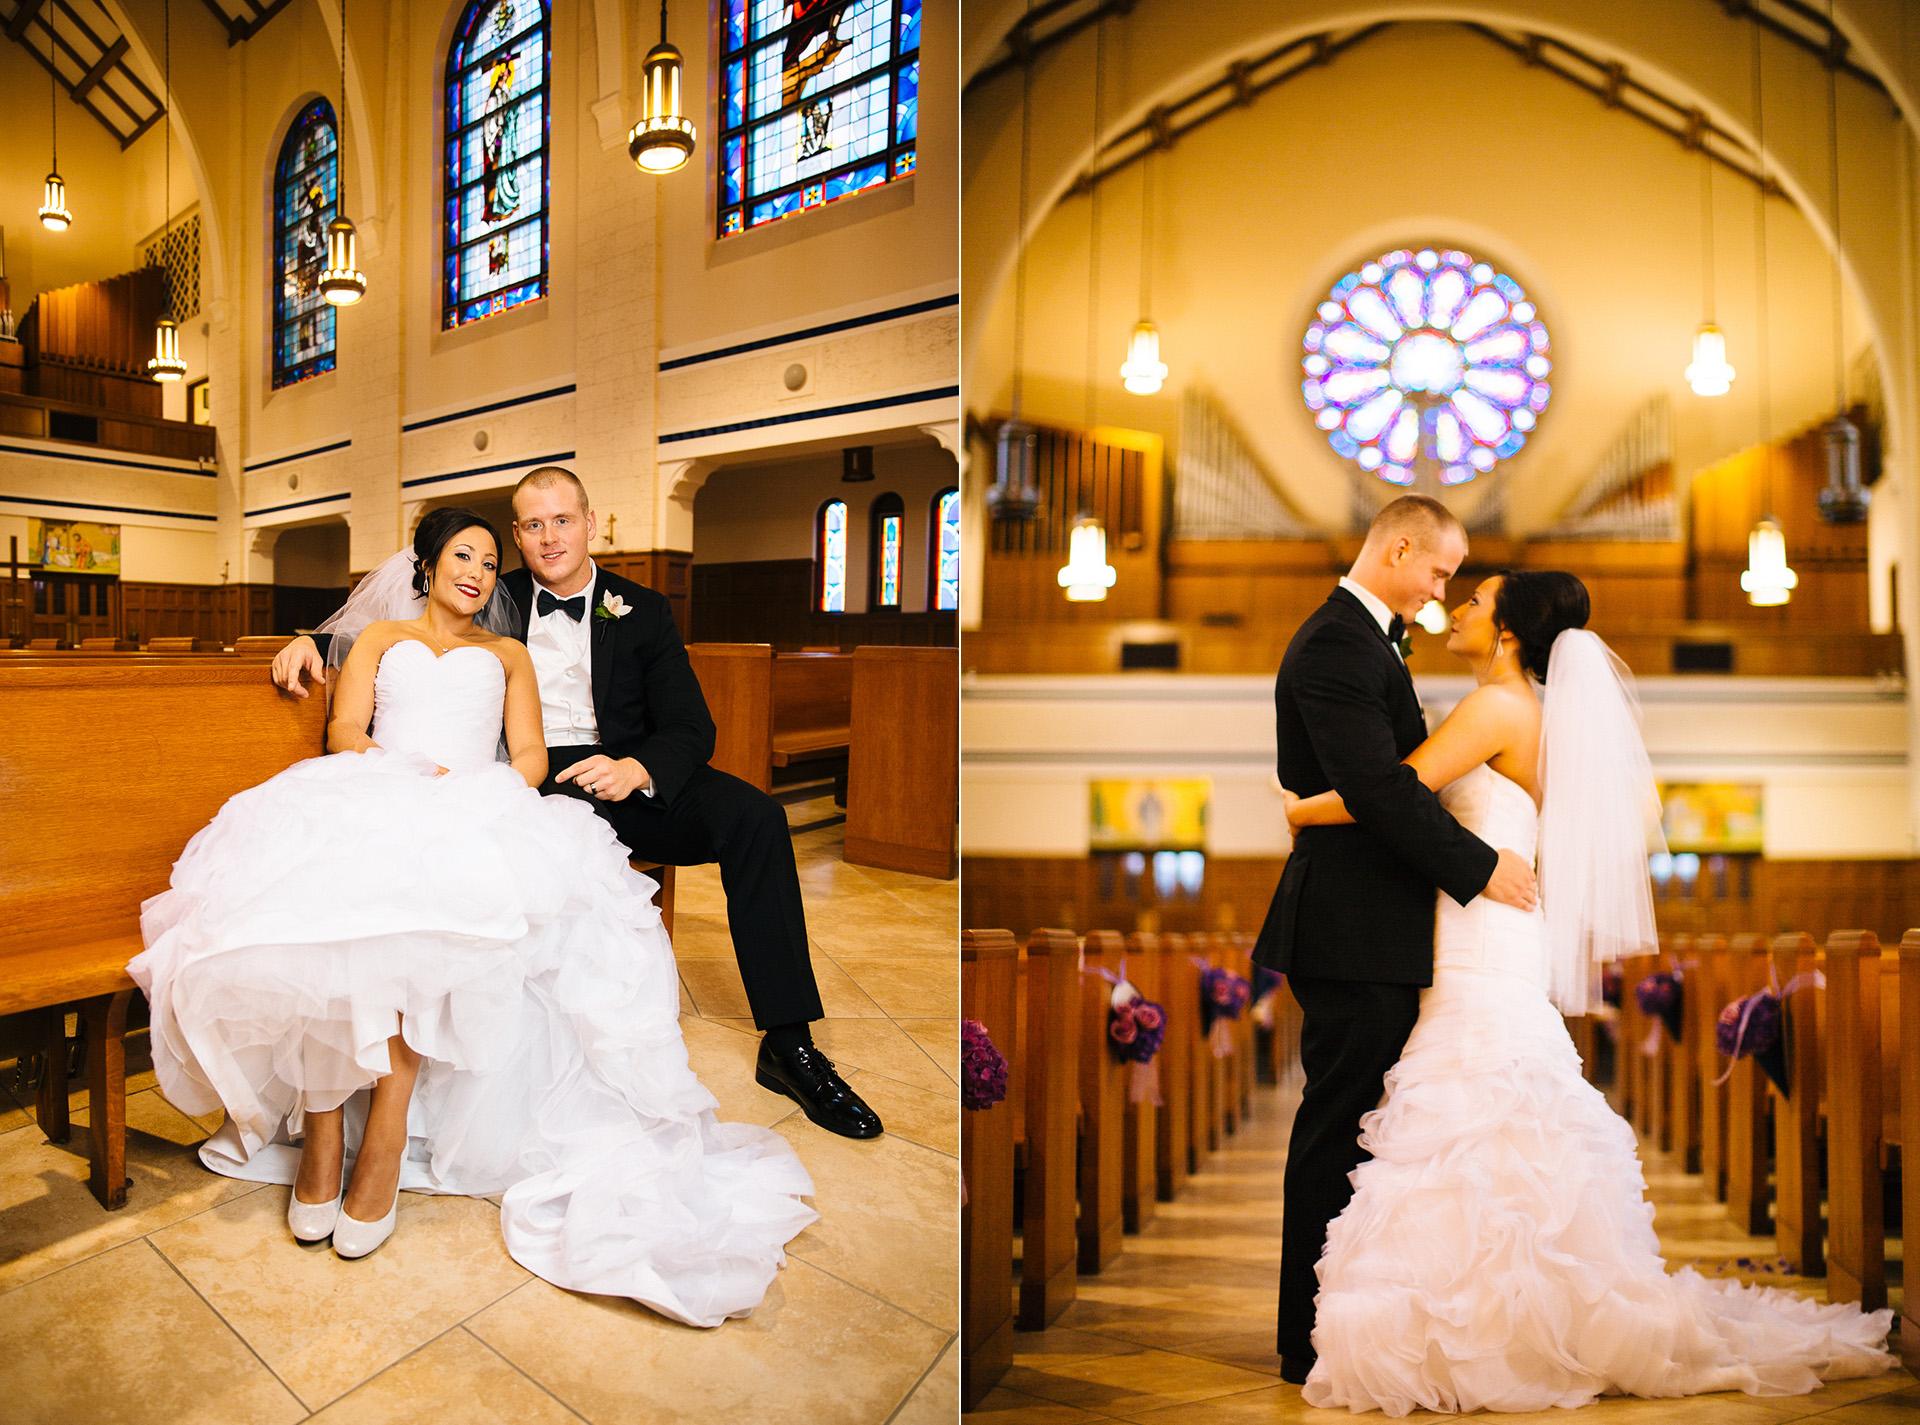 Cleveland Wedding Photographer St Christopher's Church Red Tail Golf Club 11.jpg